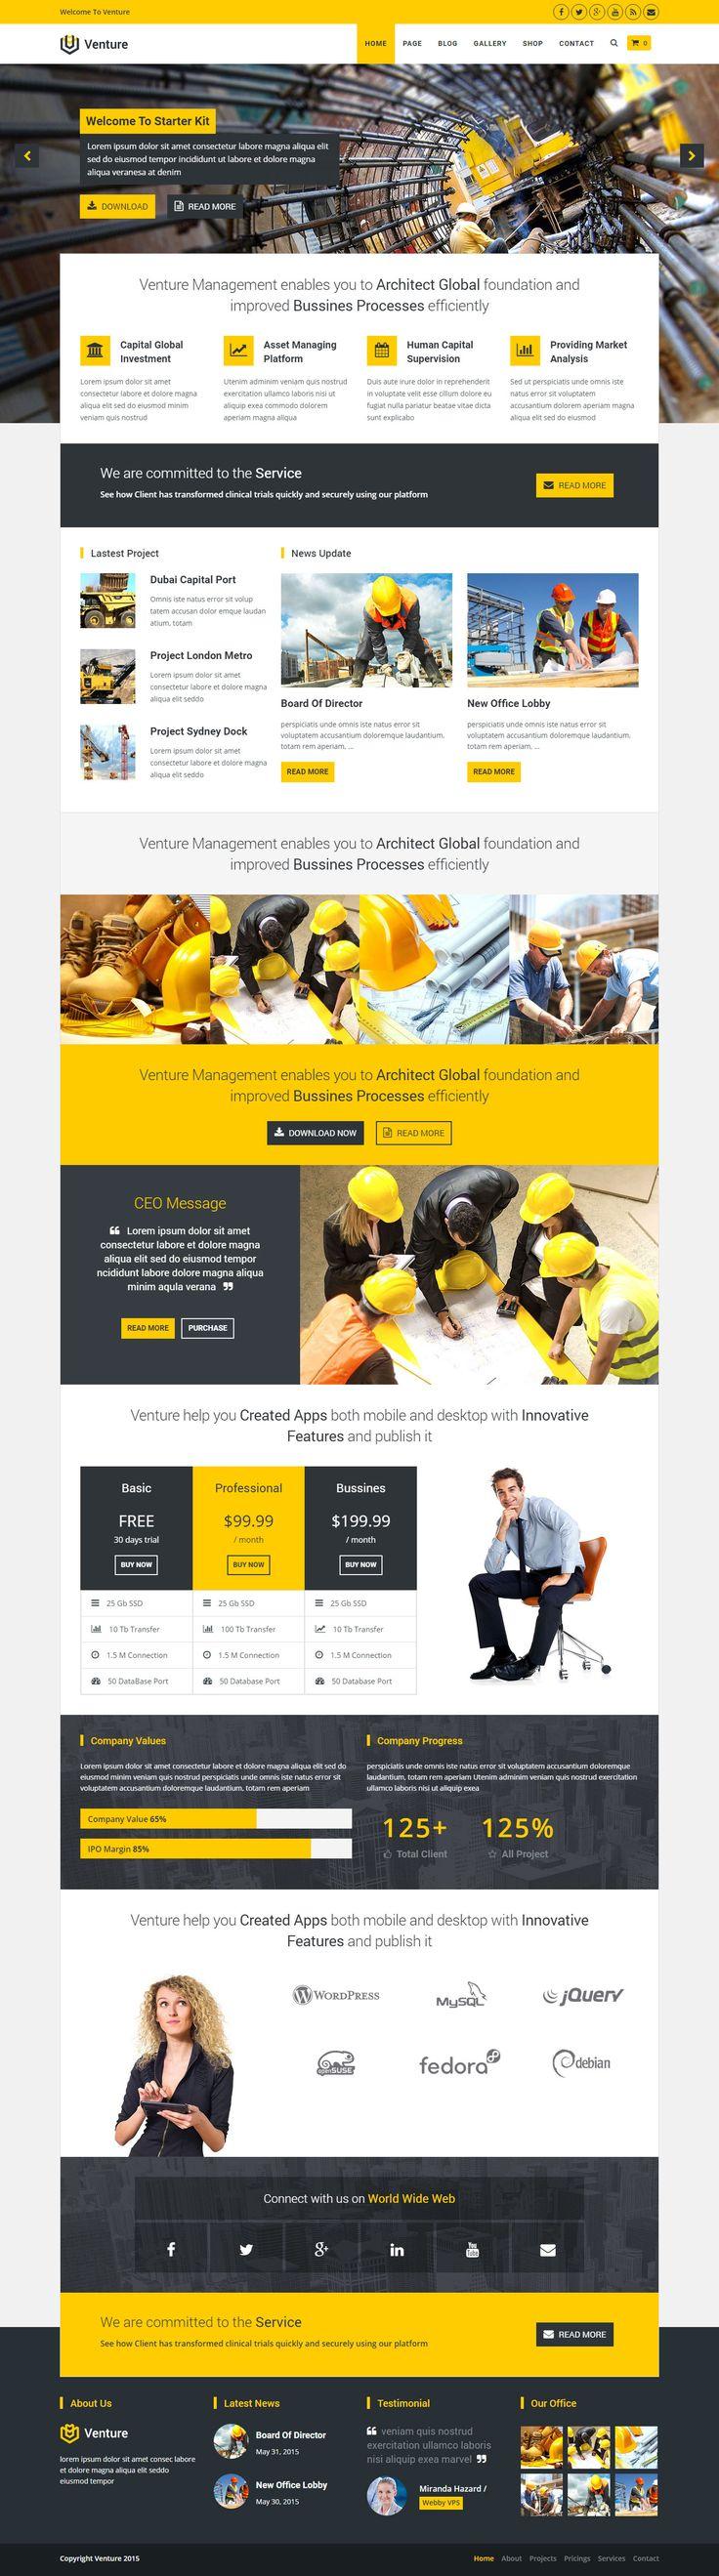 Ventureis fit for corporate, business, marketing, finance, law, construction, government, education, non profit and enterprise, bank, institution